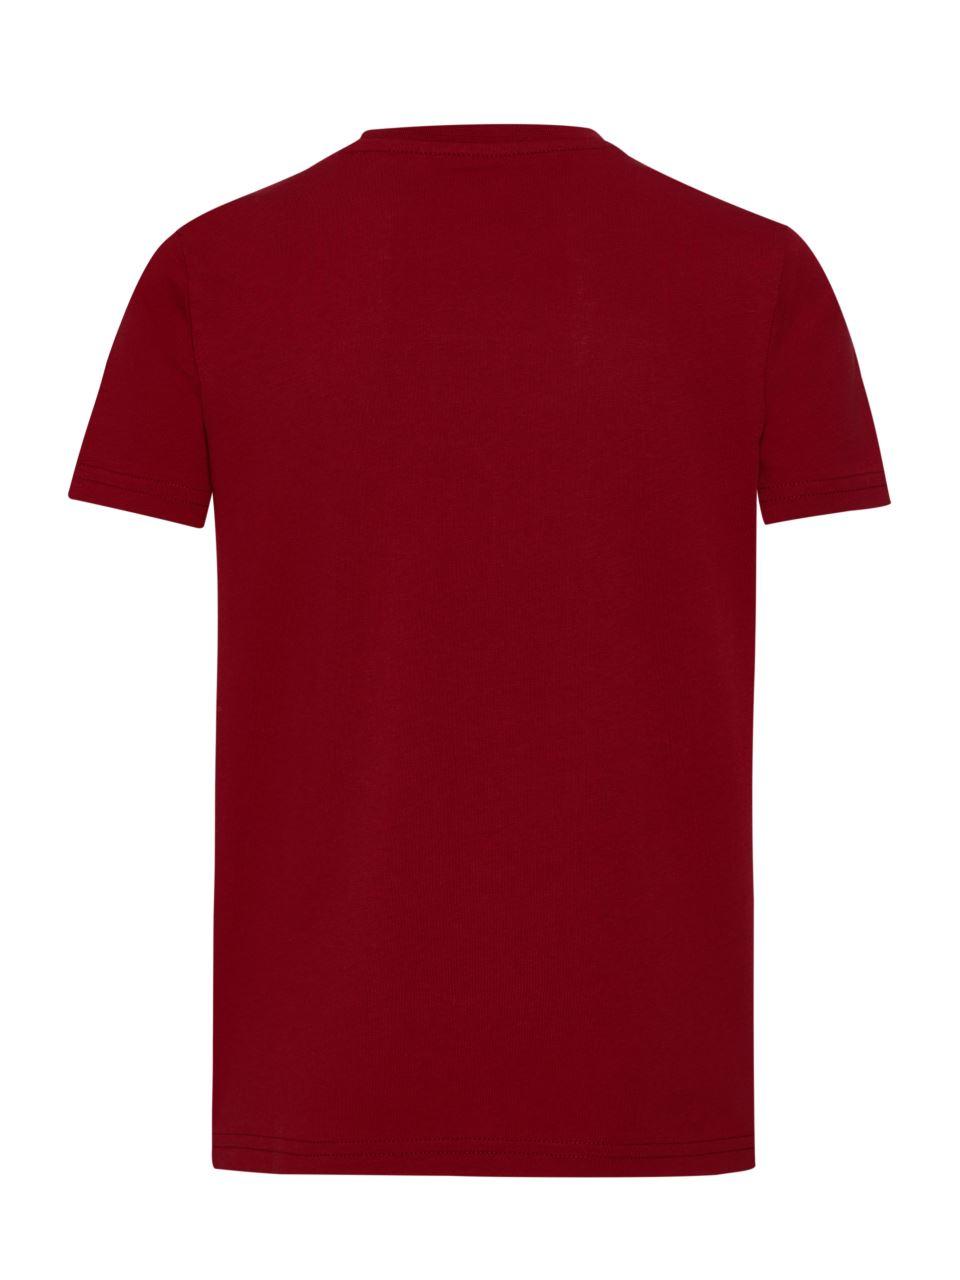 C191037 T-shirt